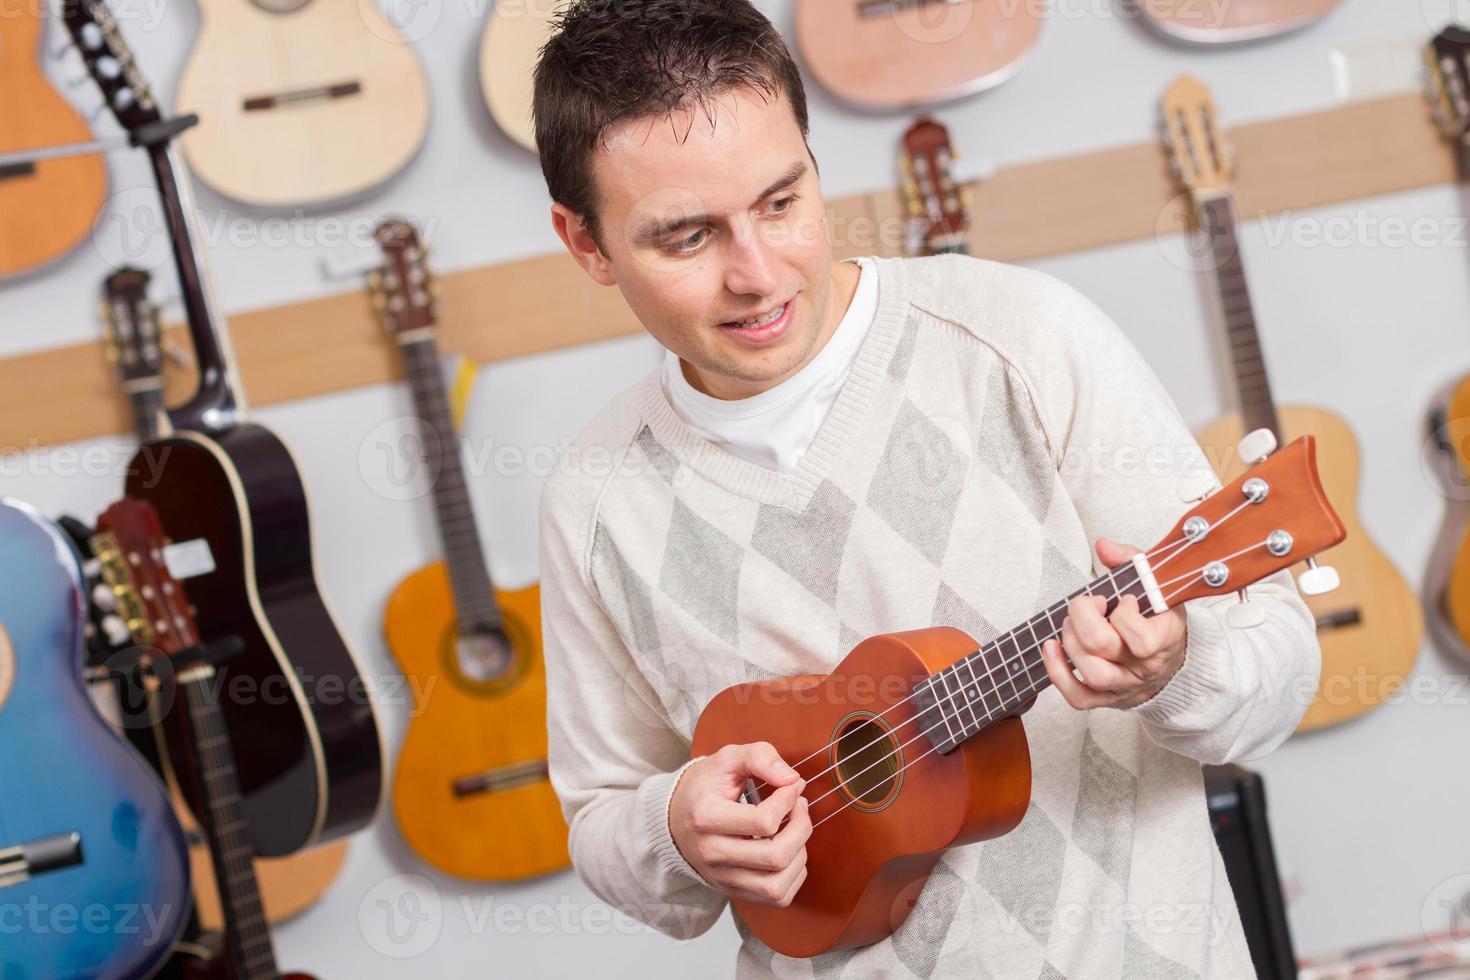 Mann spielt Ukelele im Musikgeschäft foto